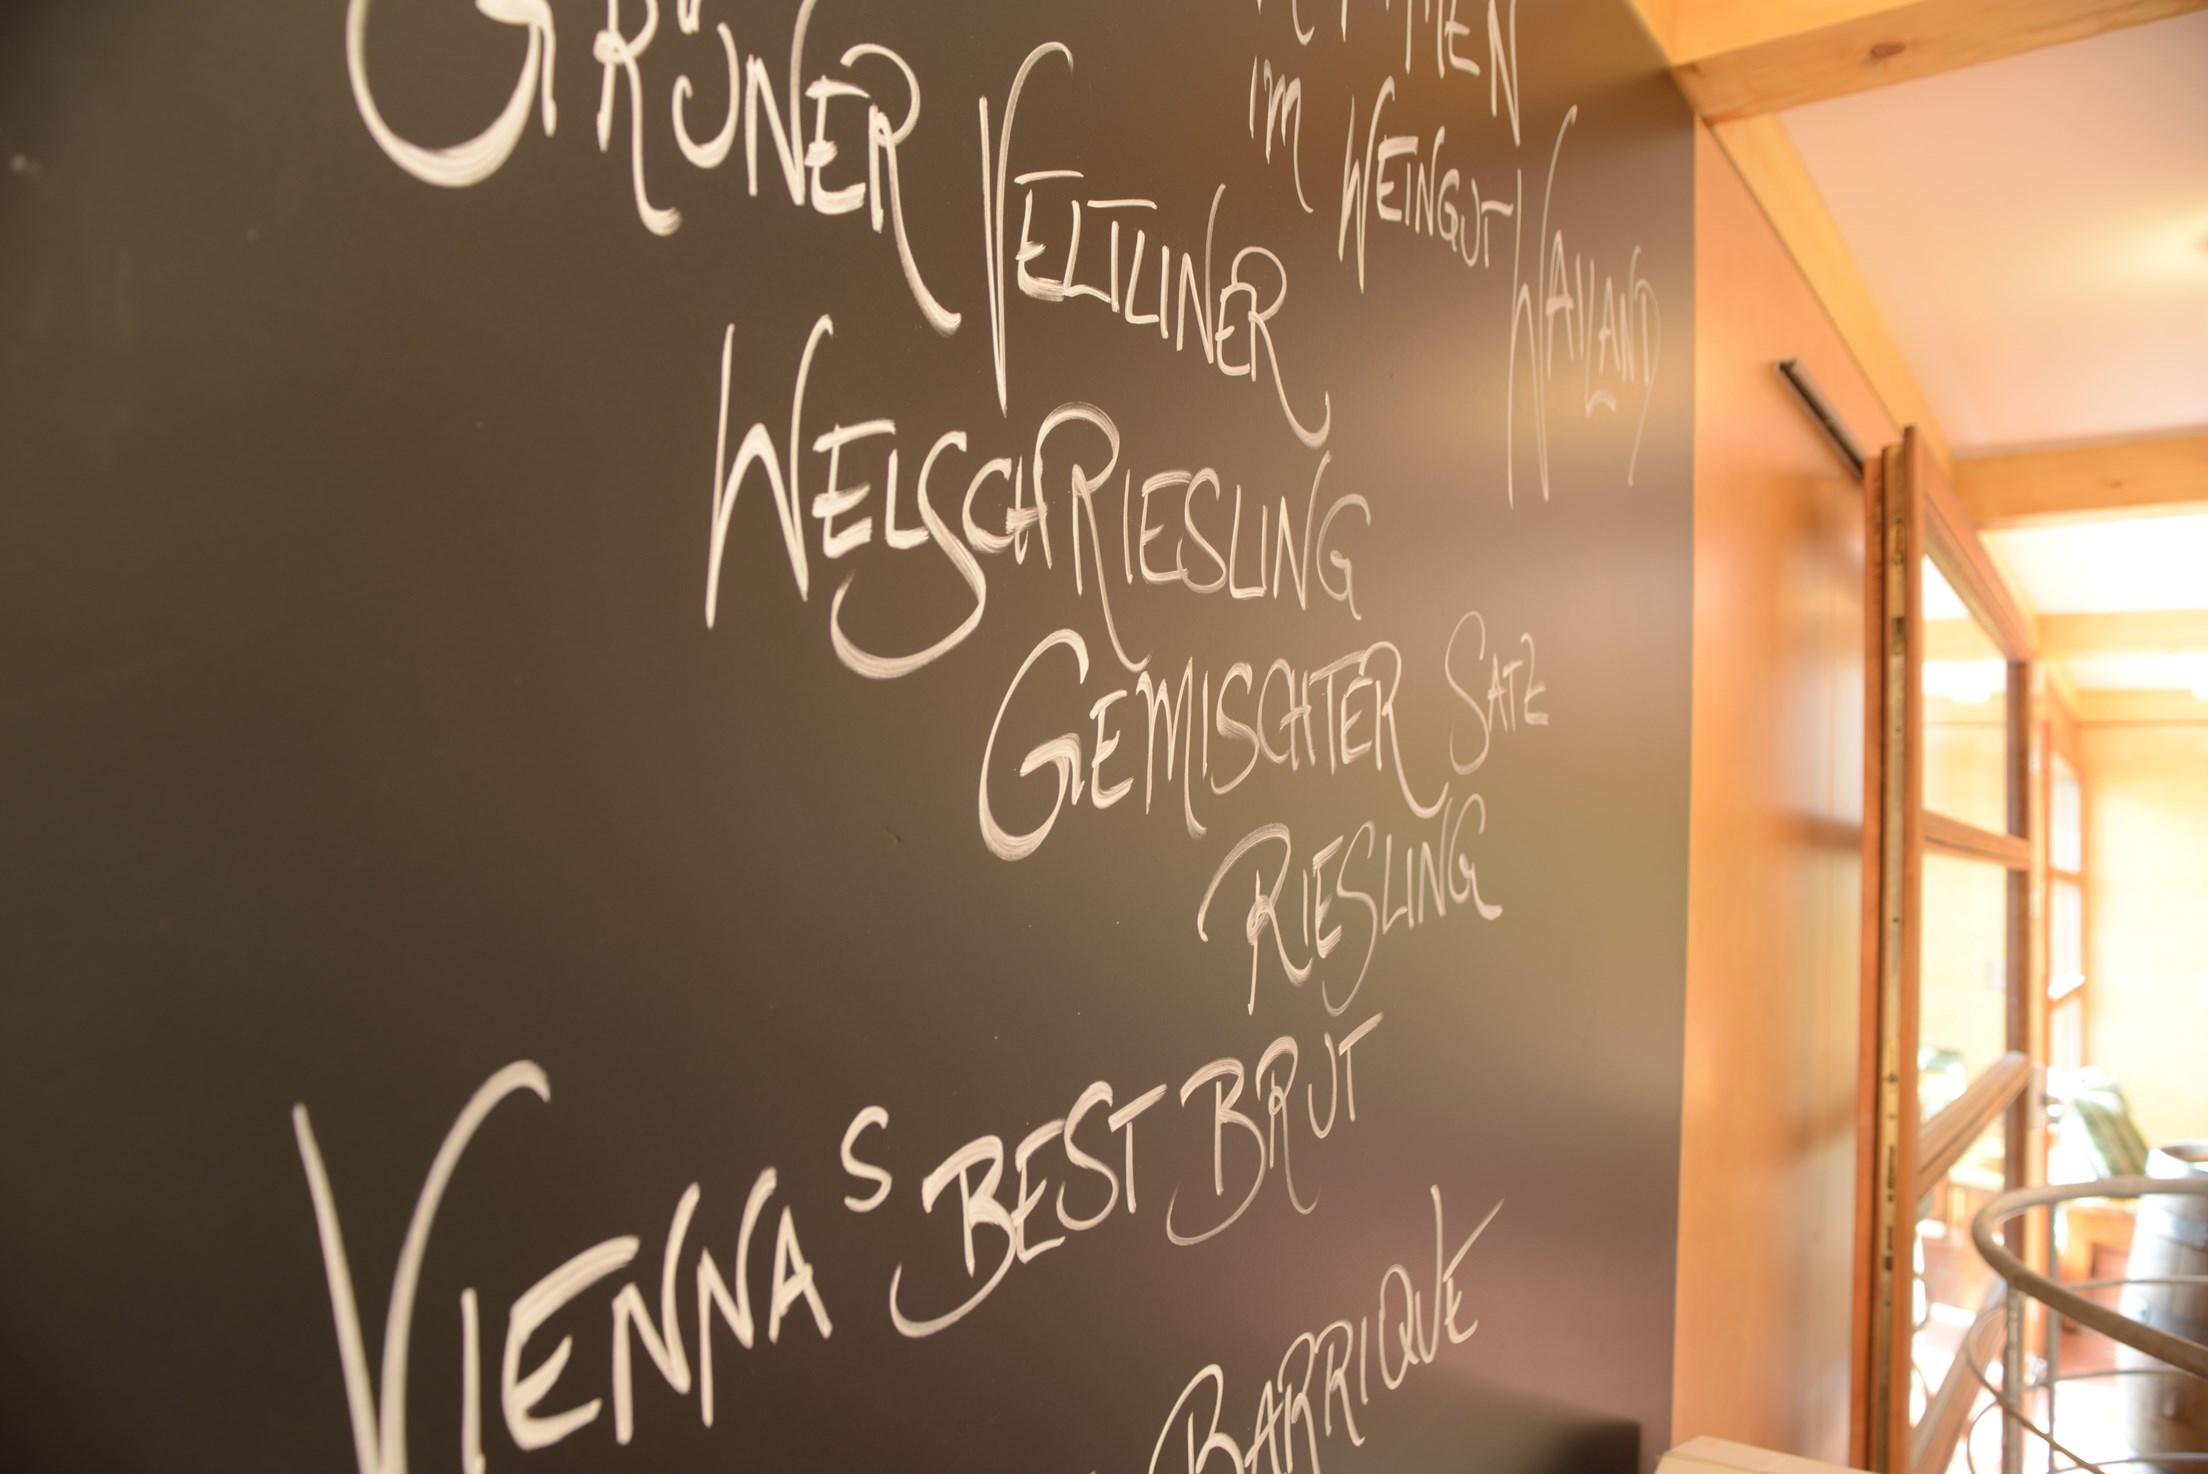 Weinbrett... - Theresa Bentz.jpg